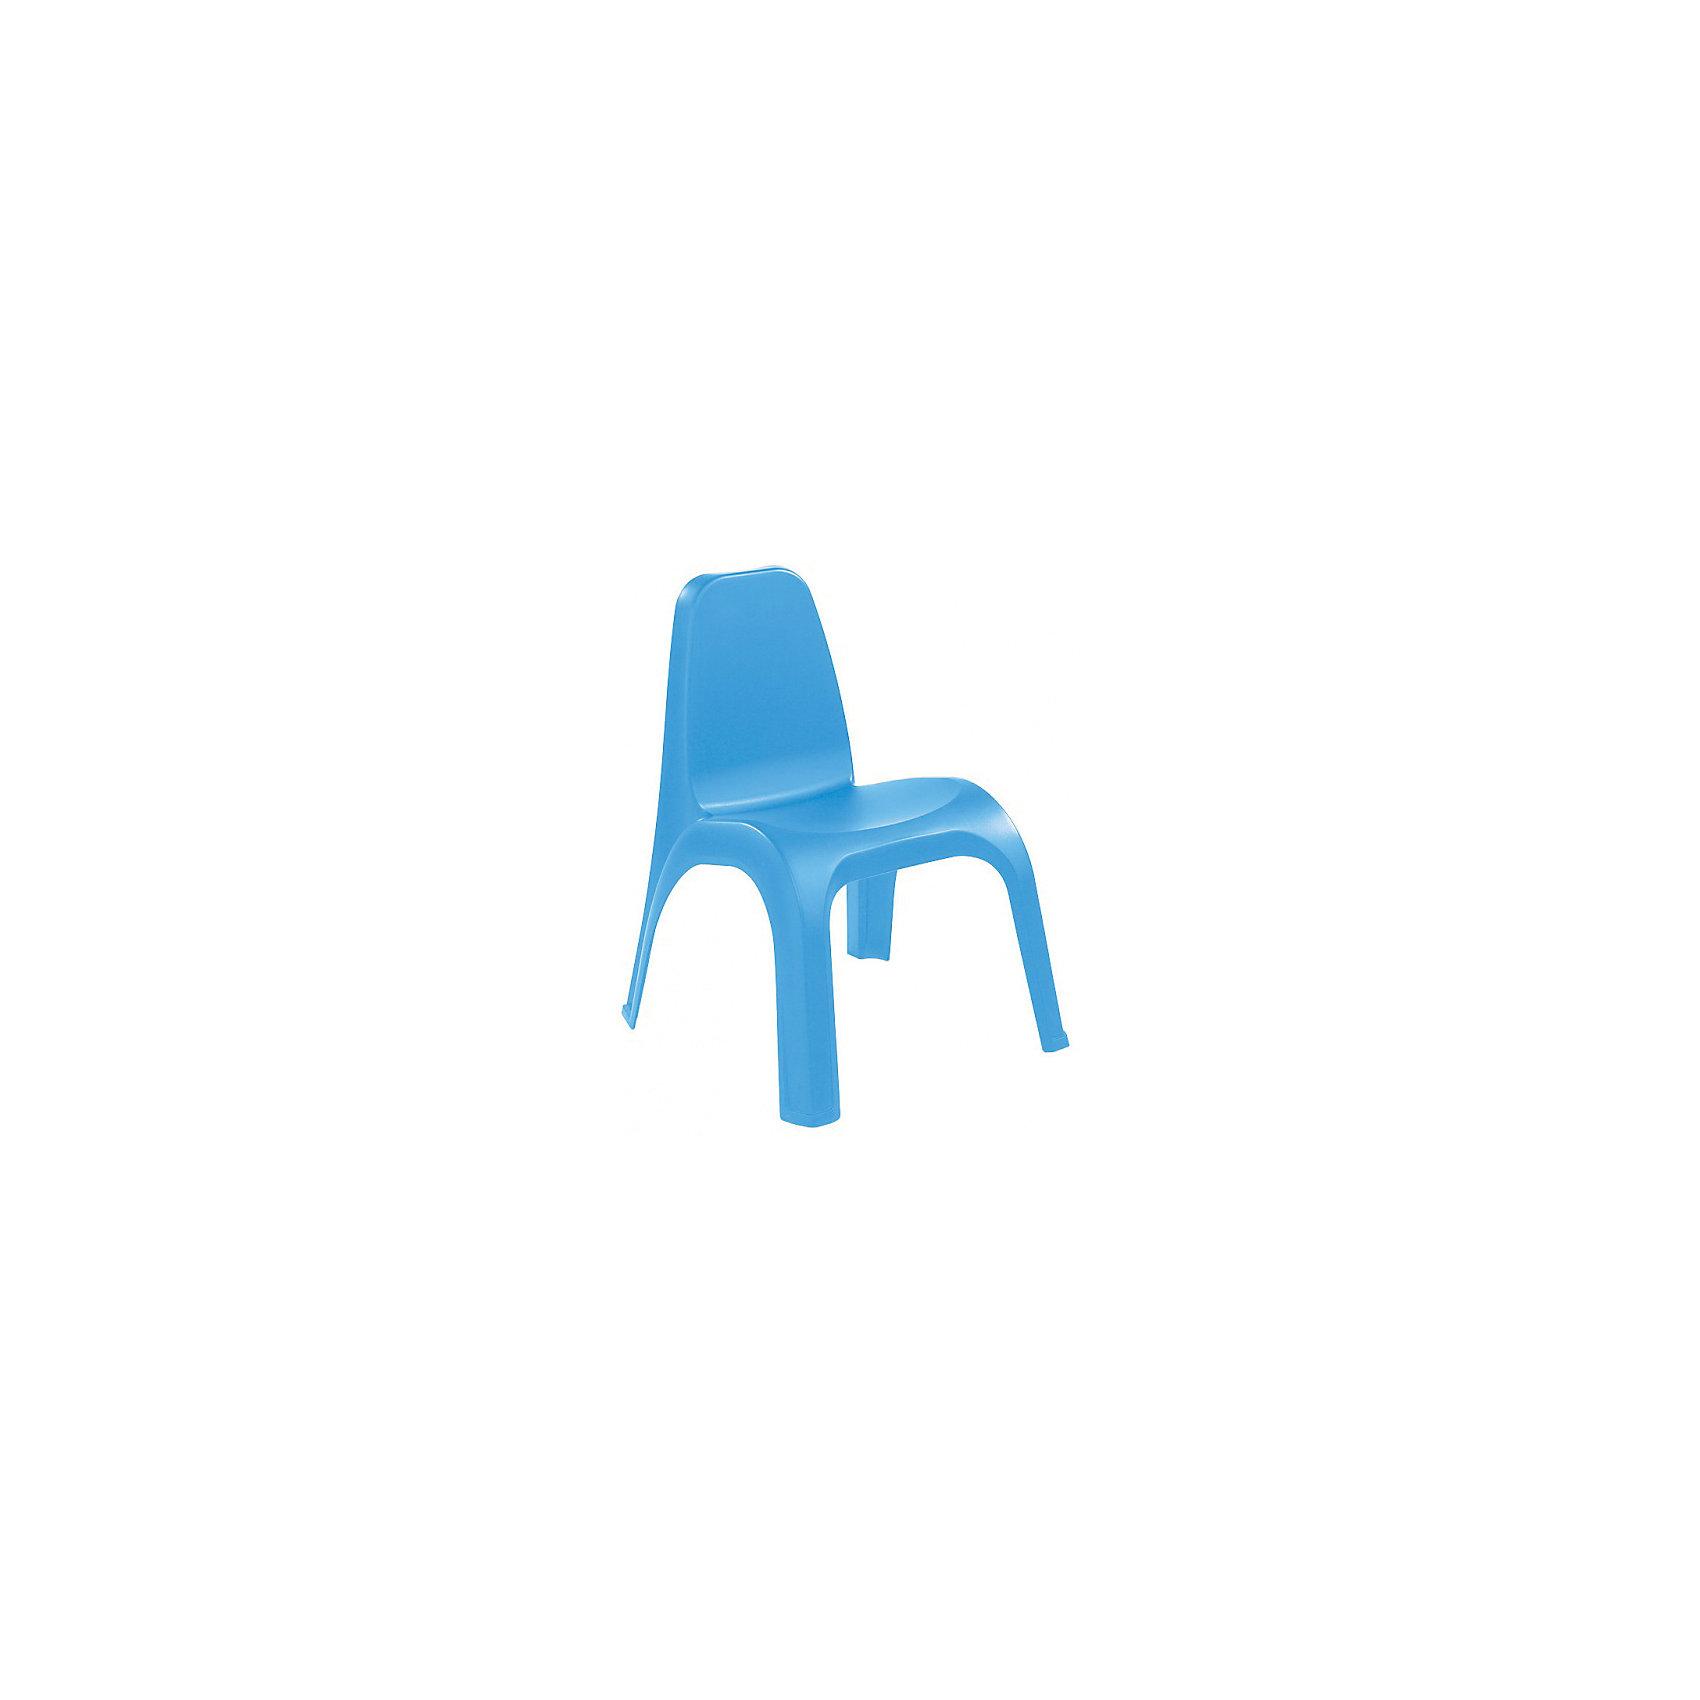 Пластишка Стул 380х425х525 мм, Пластишка, голубой пластишка горка для купания детей пластишка